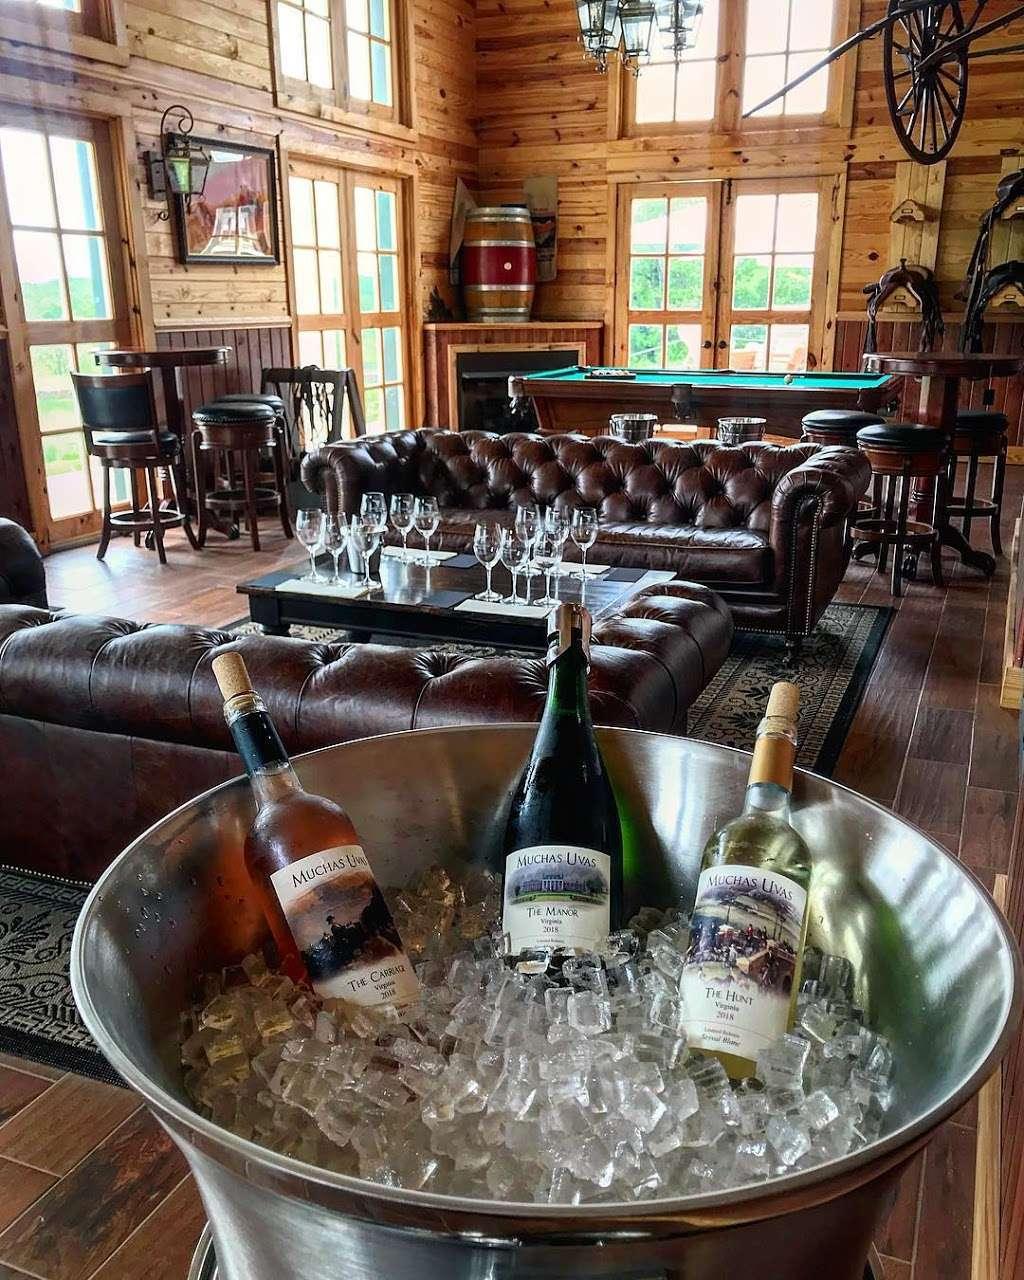 Muchas Uvas Winery - travel agency    Photo 8 of 10   Address: 116 High Meadow Manor LN, Flint Hill, VA 22627, USA   Phone: (202) 258-7095